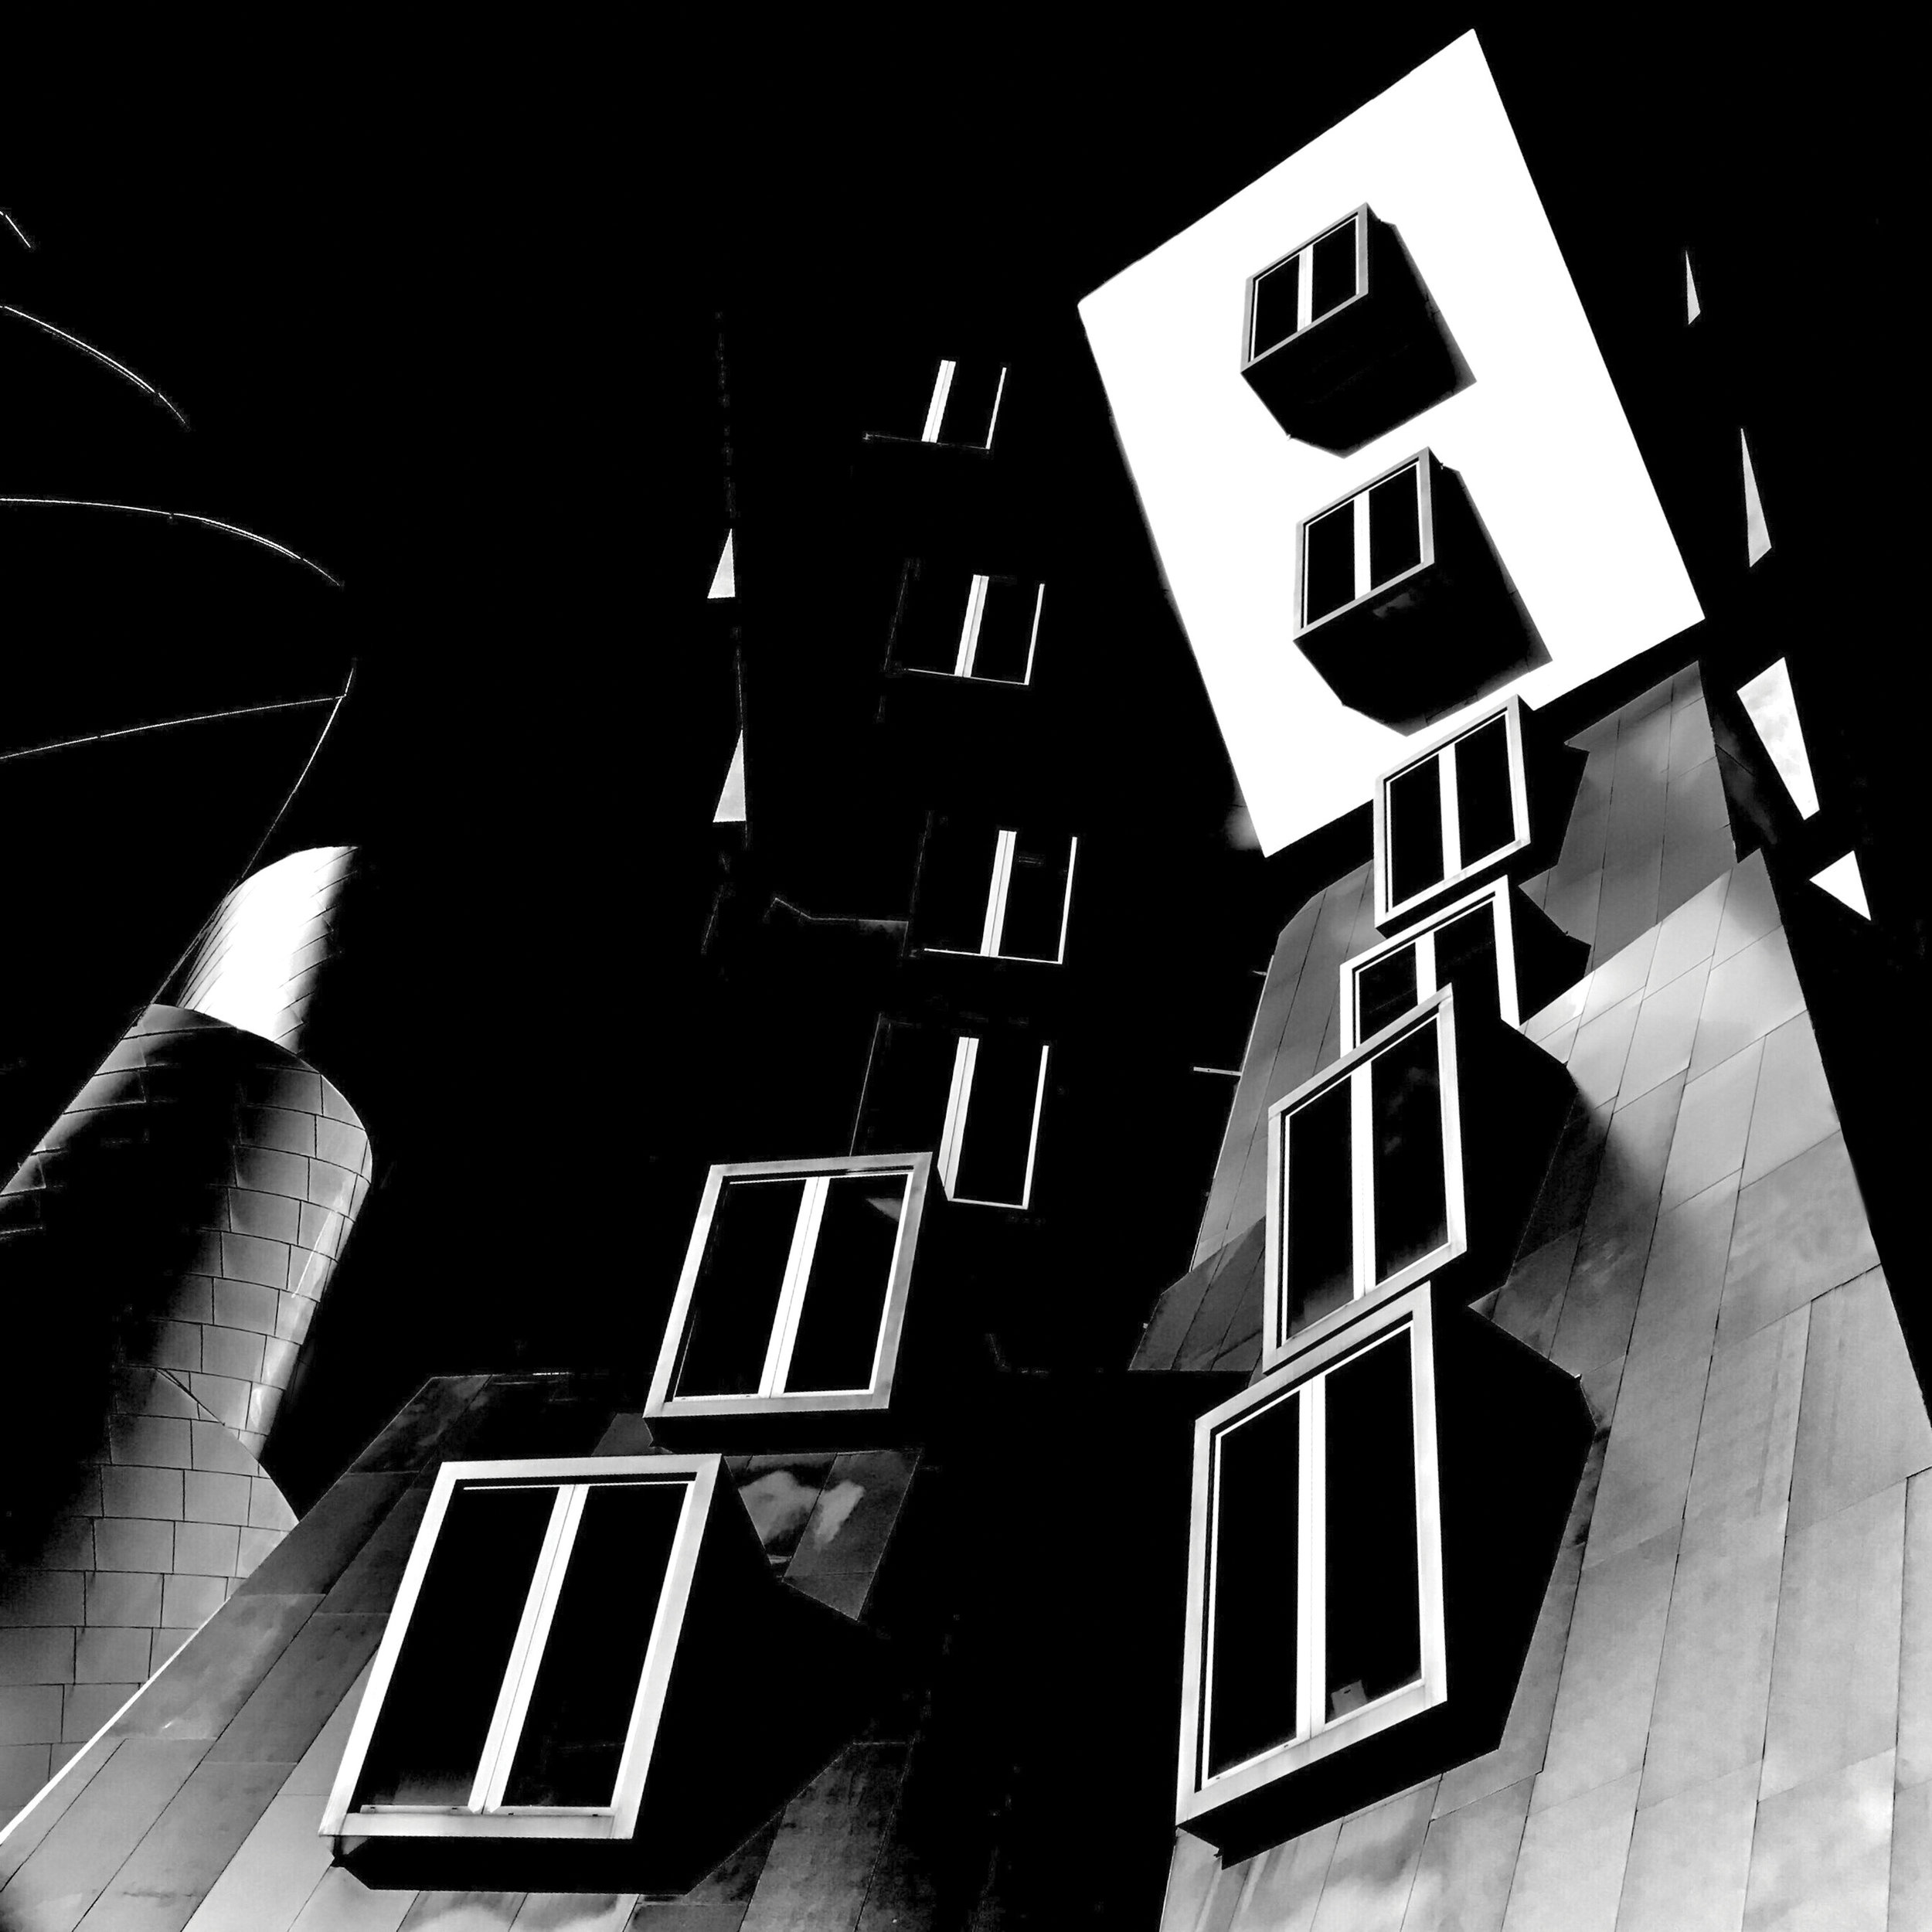 Images of Structure, Form No. 4 ,  Joshua Sariñana